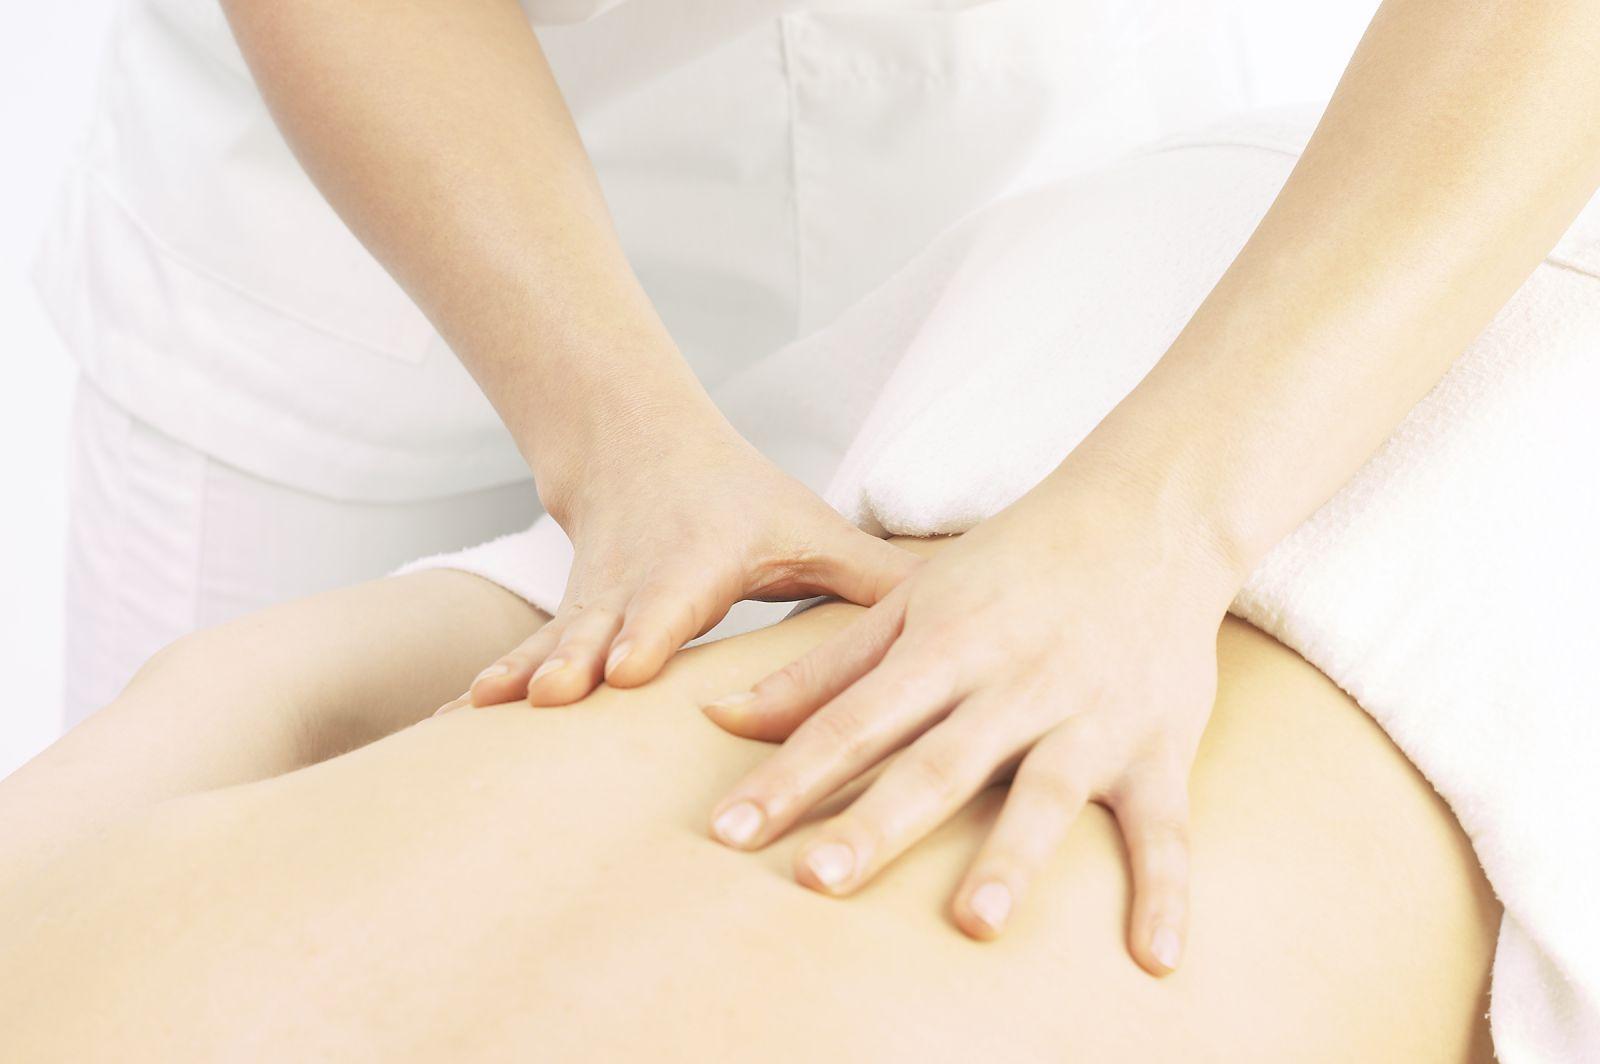 Остеопатия, как метод лечения